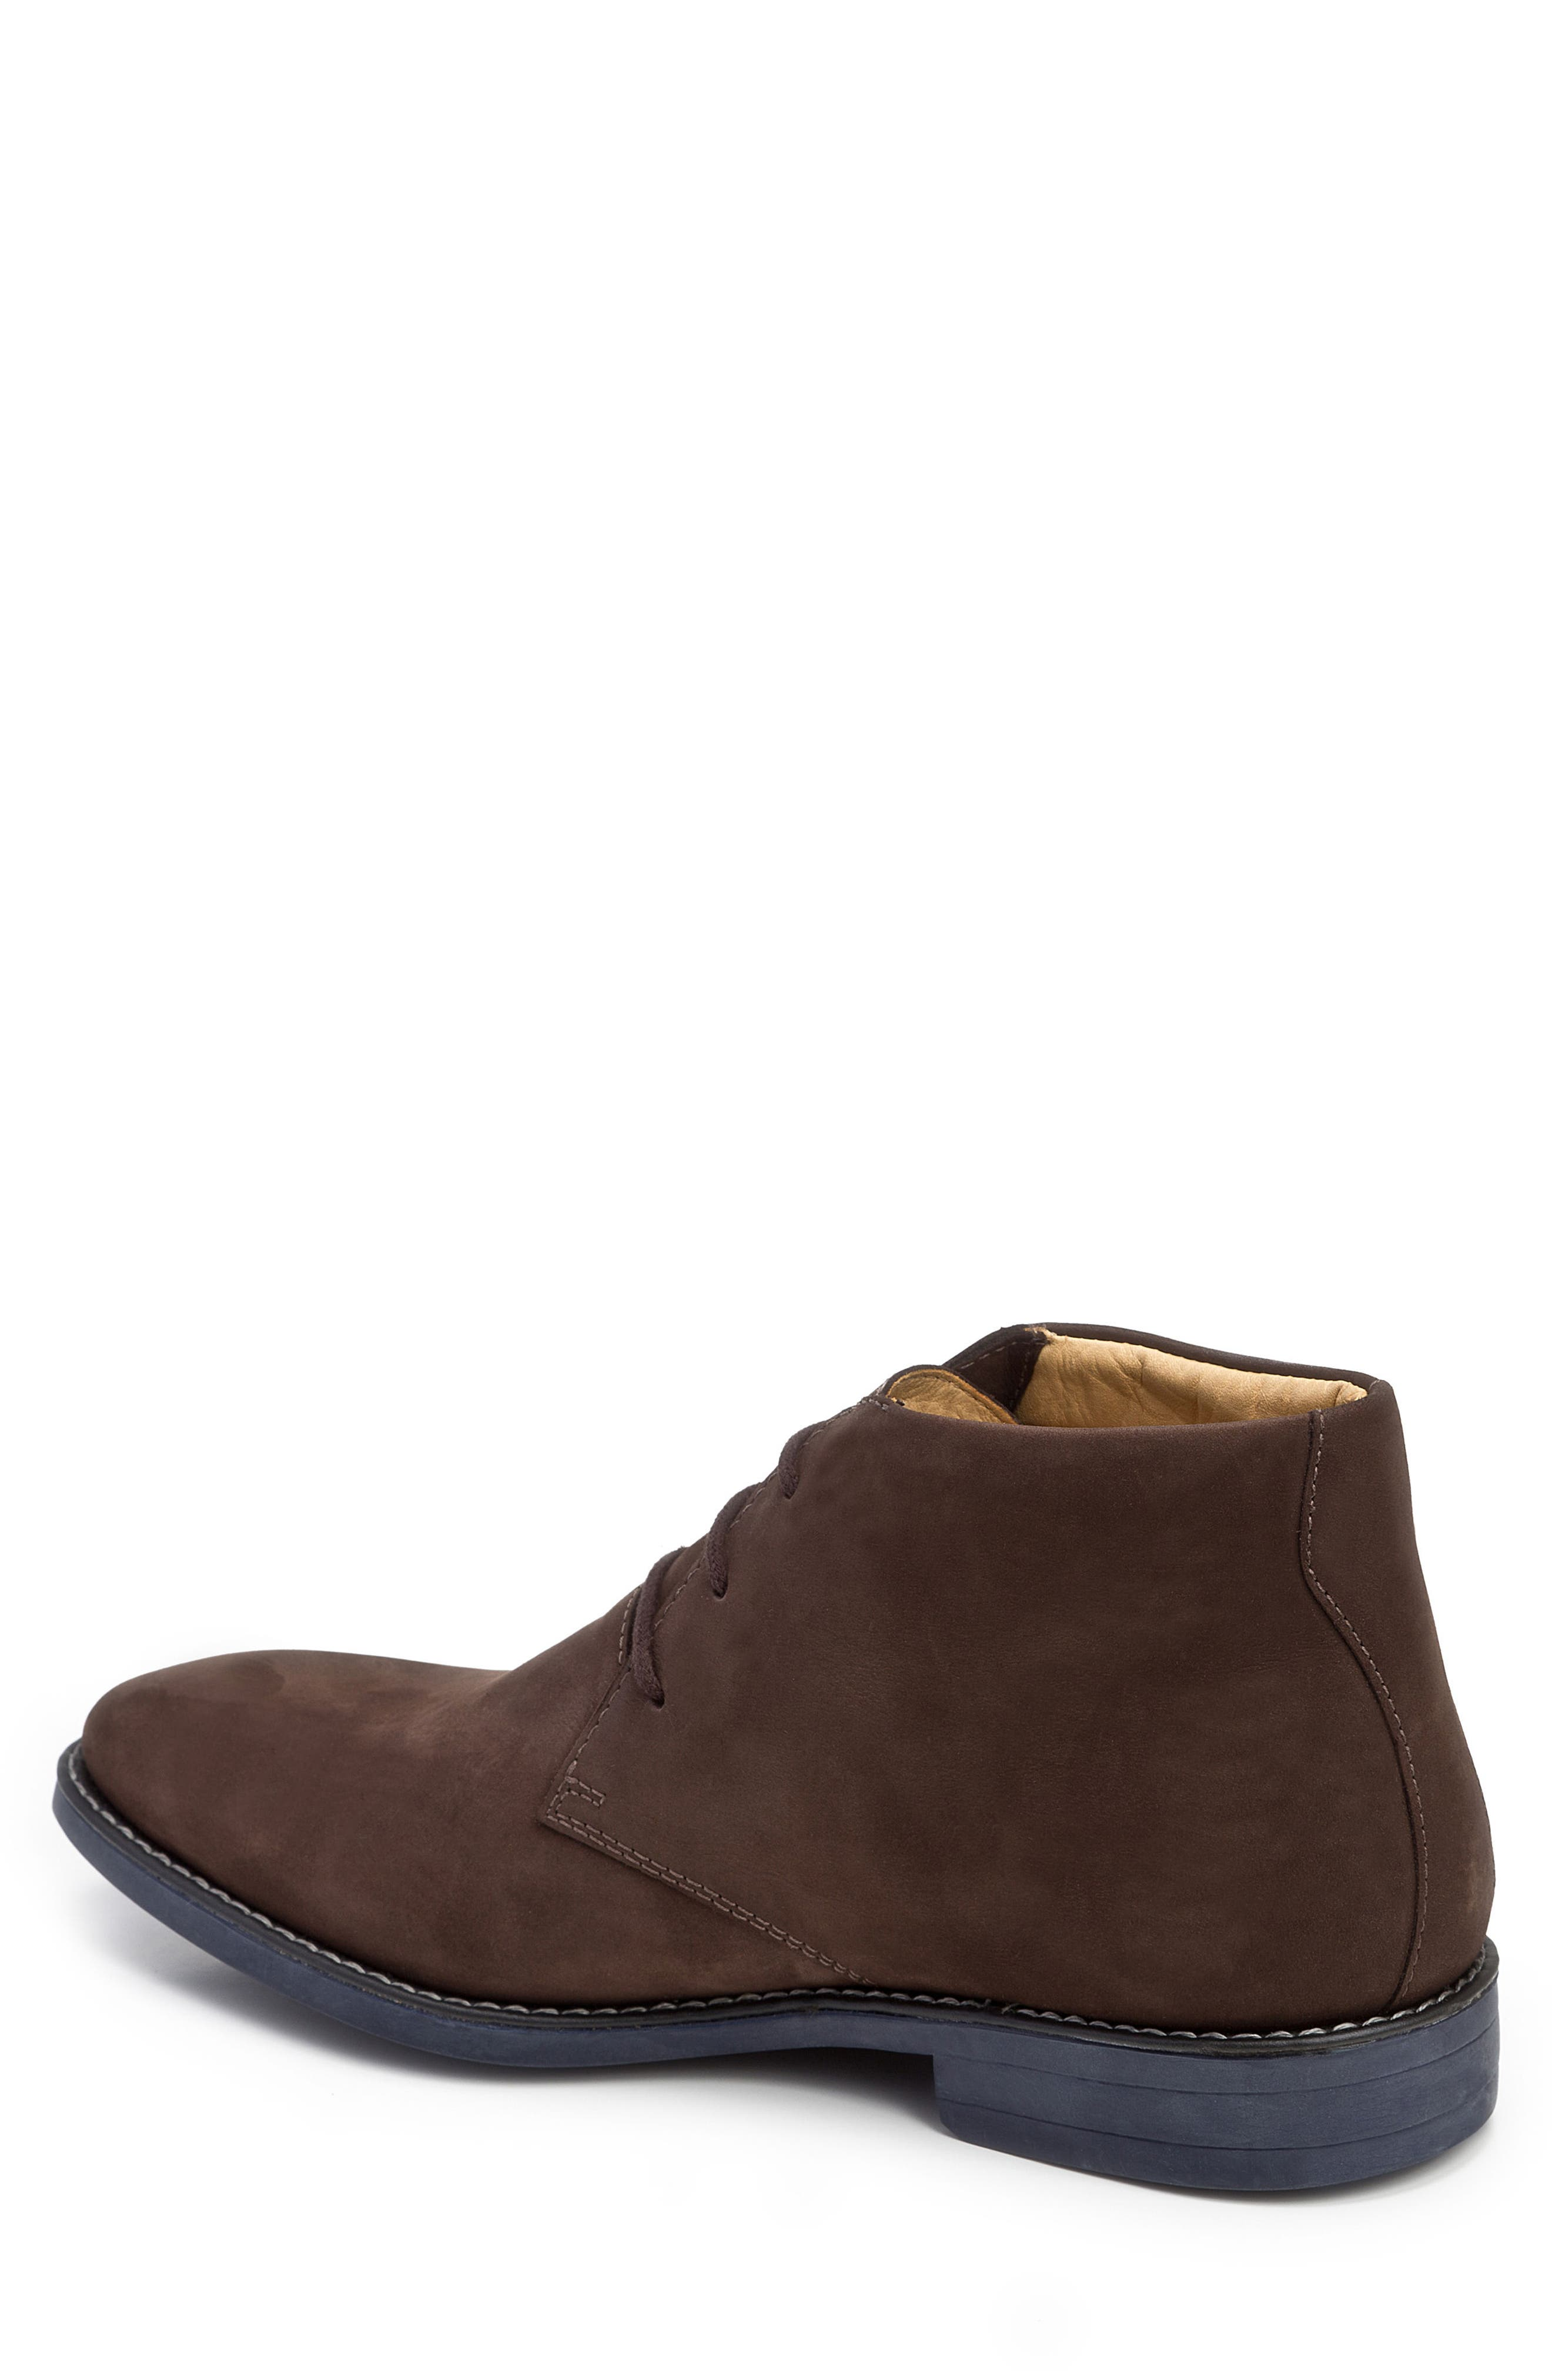 Nick Chukka Boot,                             Alternate thumbnail 2, color,                             Brown Nubuck Leather